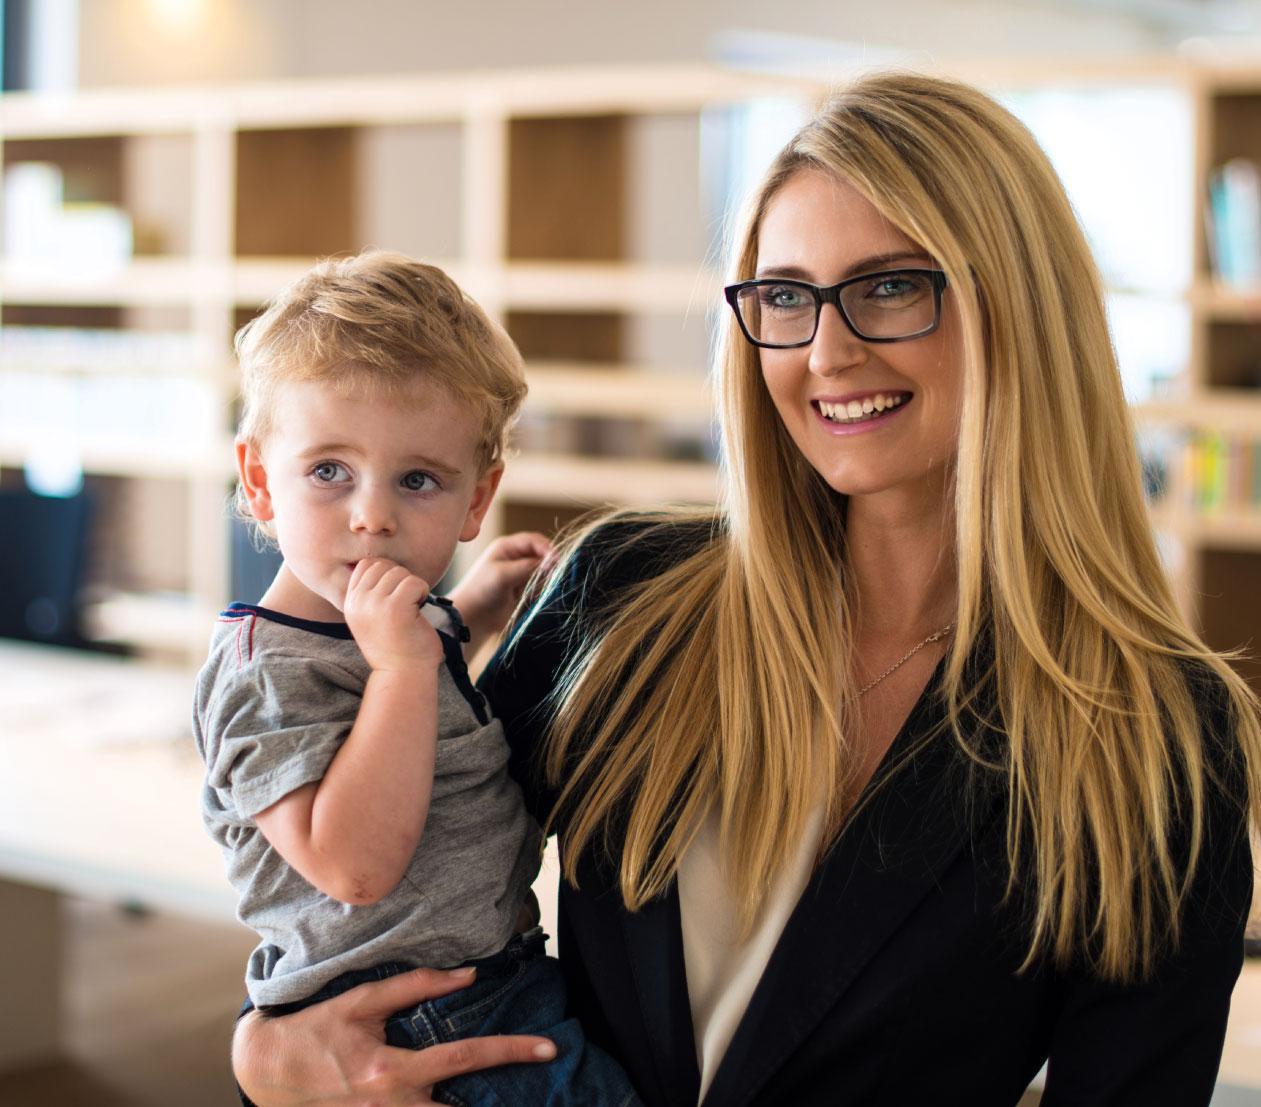 New-photo--mom-lady.jpg